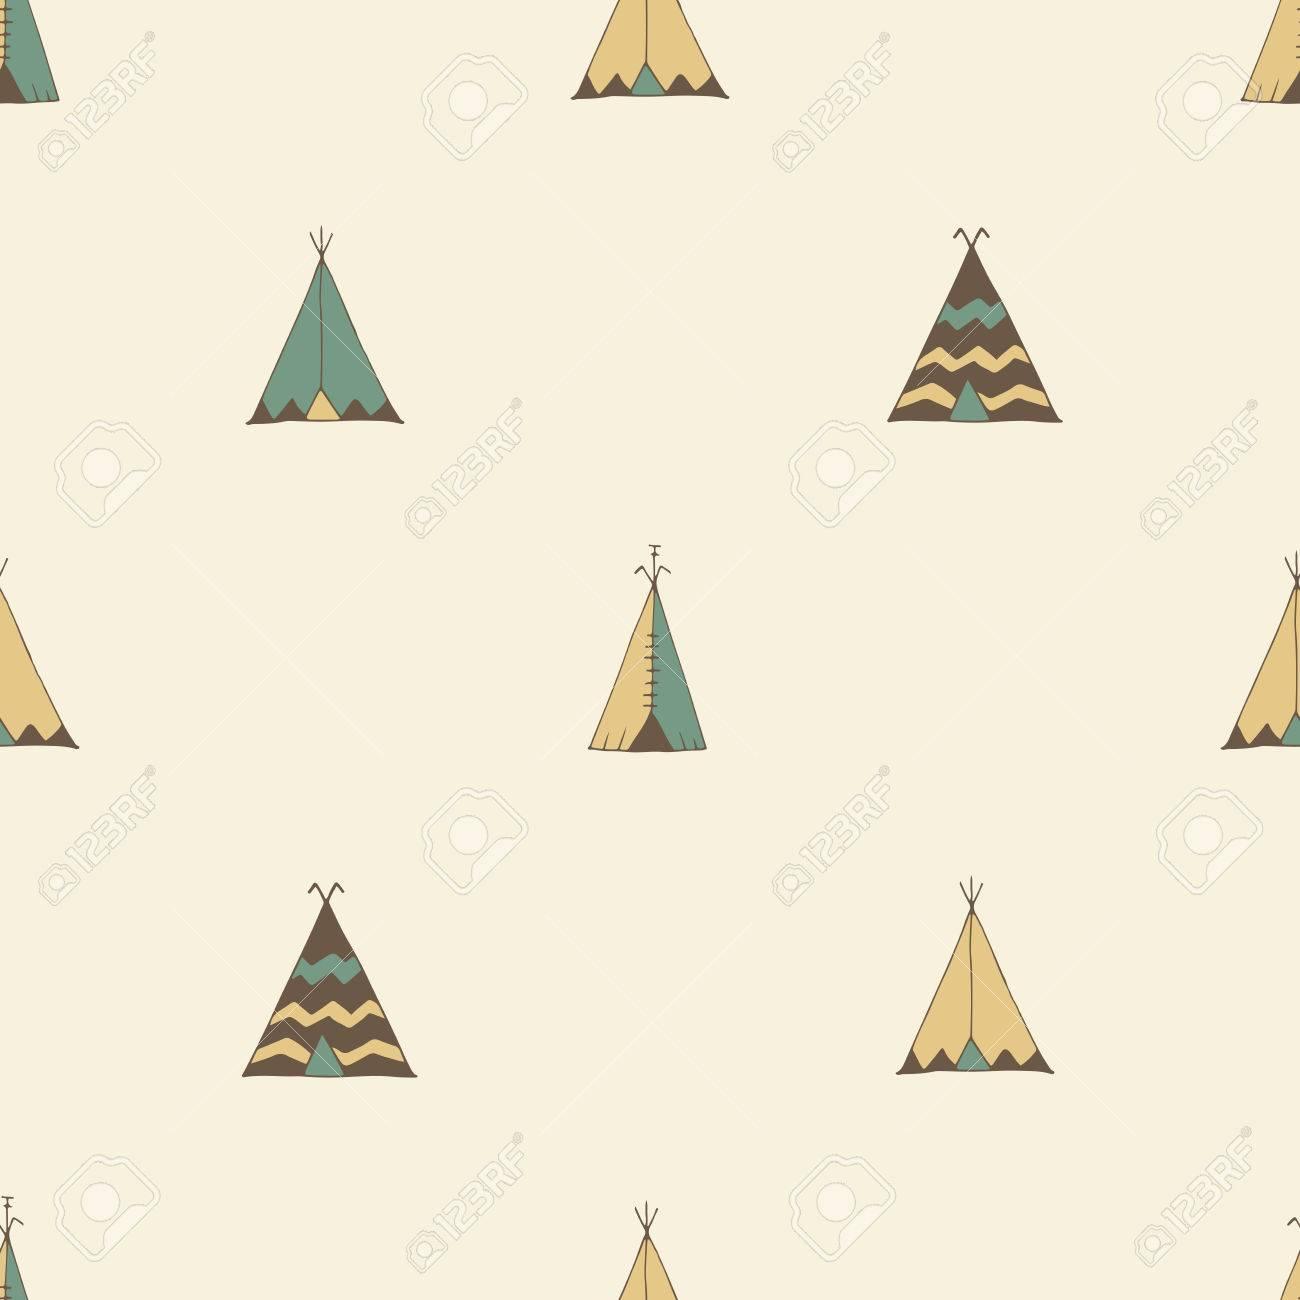 Teepee native american summer tent illustration in vector. Stock Vector - 58119742  sc 1 st  123RF Stock Photos & Teepee Native American Summer Tent Illustration In Vector. Royalty ...